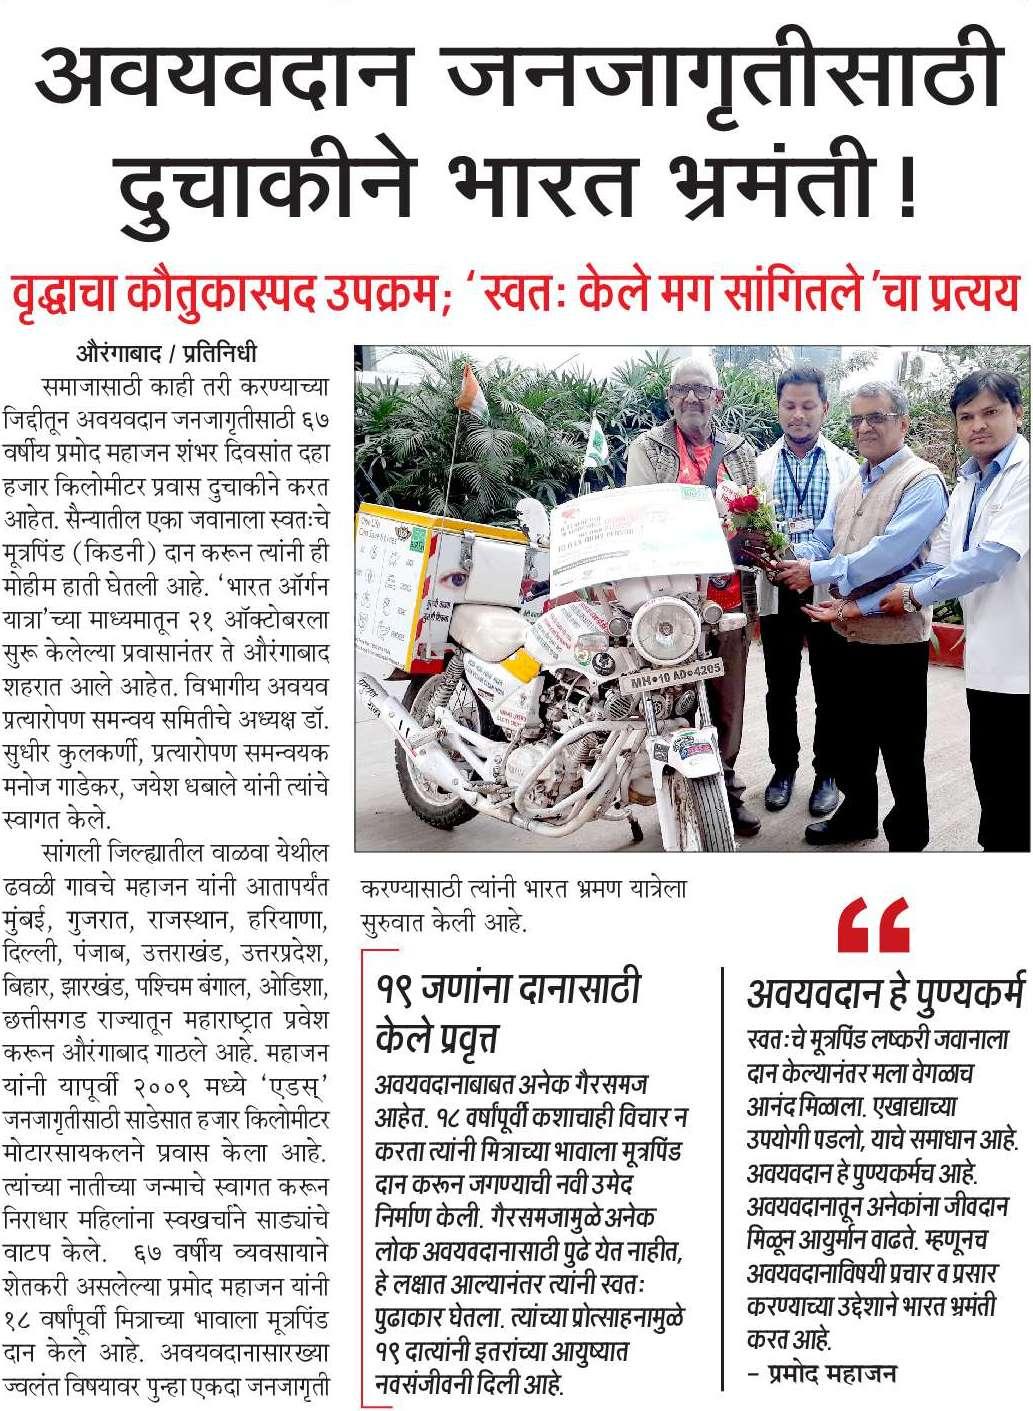 17-december-2018-Aurangabad-2-Punya-Nagari.jpg